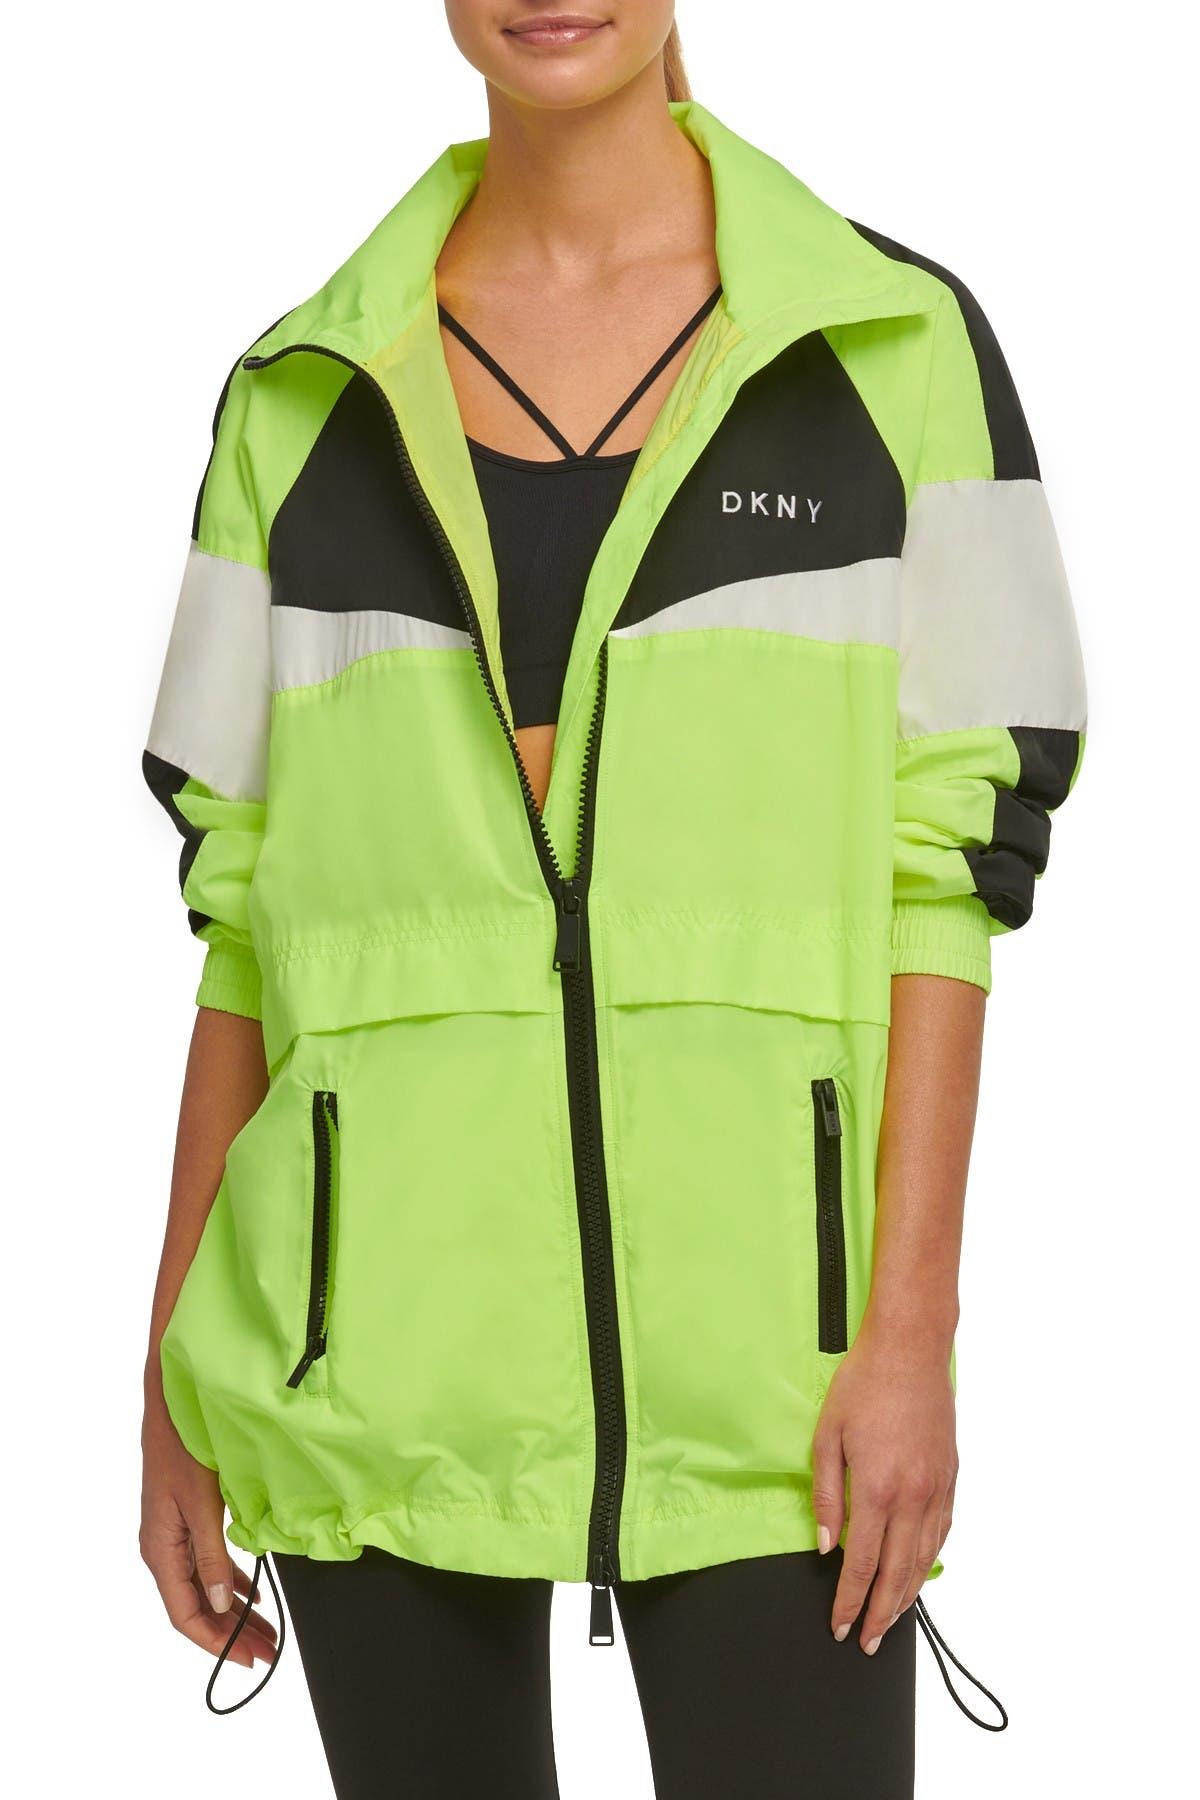 Image of DKNY Color Block Windbreaker